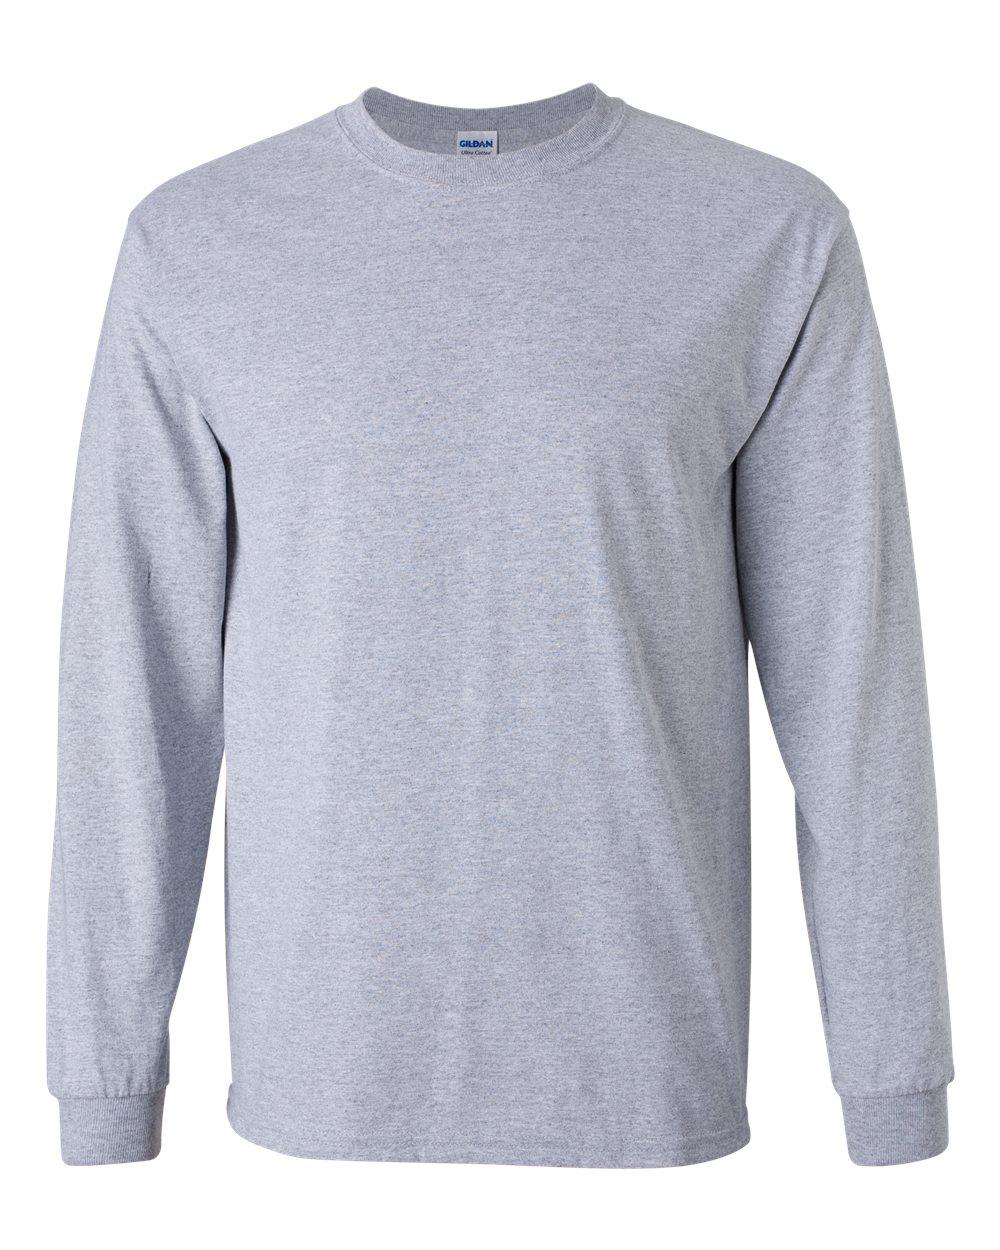 Dubuque Independent Football League - Product  Adult 100% Cotton Long  Sleeve T-Shirt (Grey) bca39391e5e